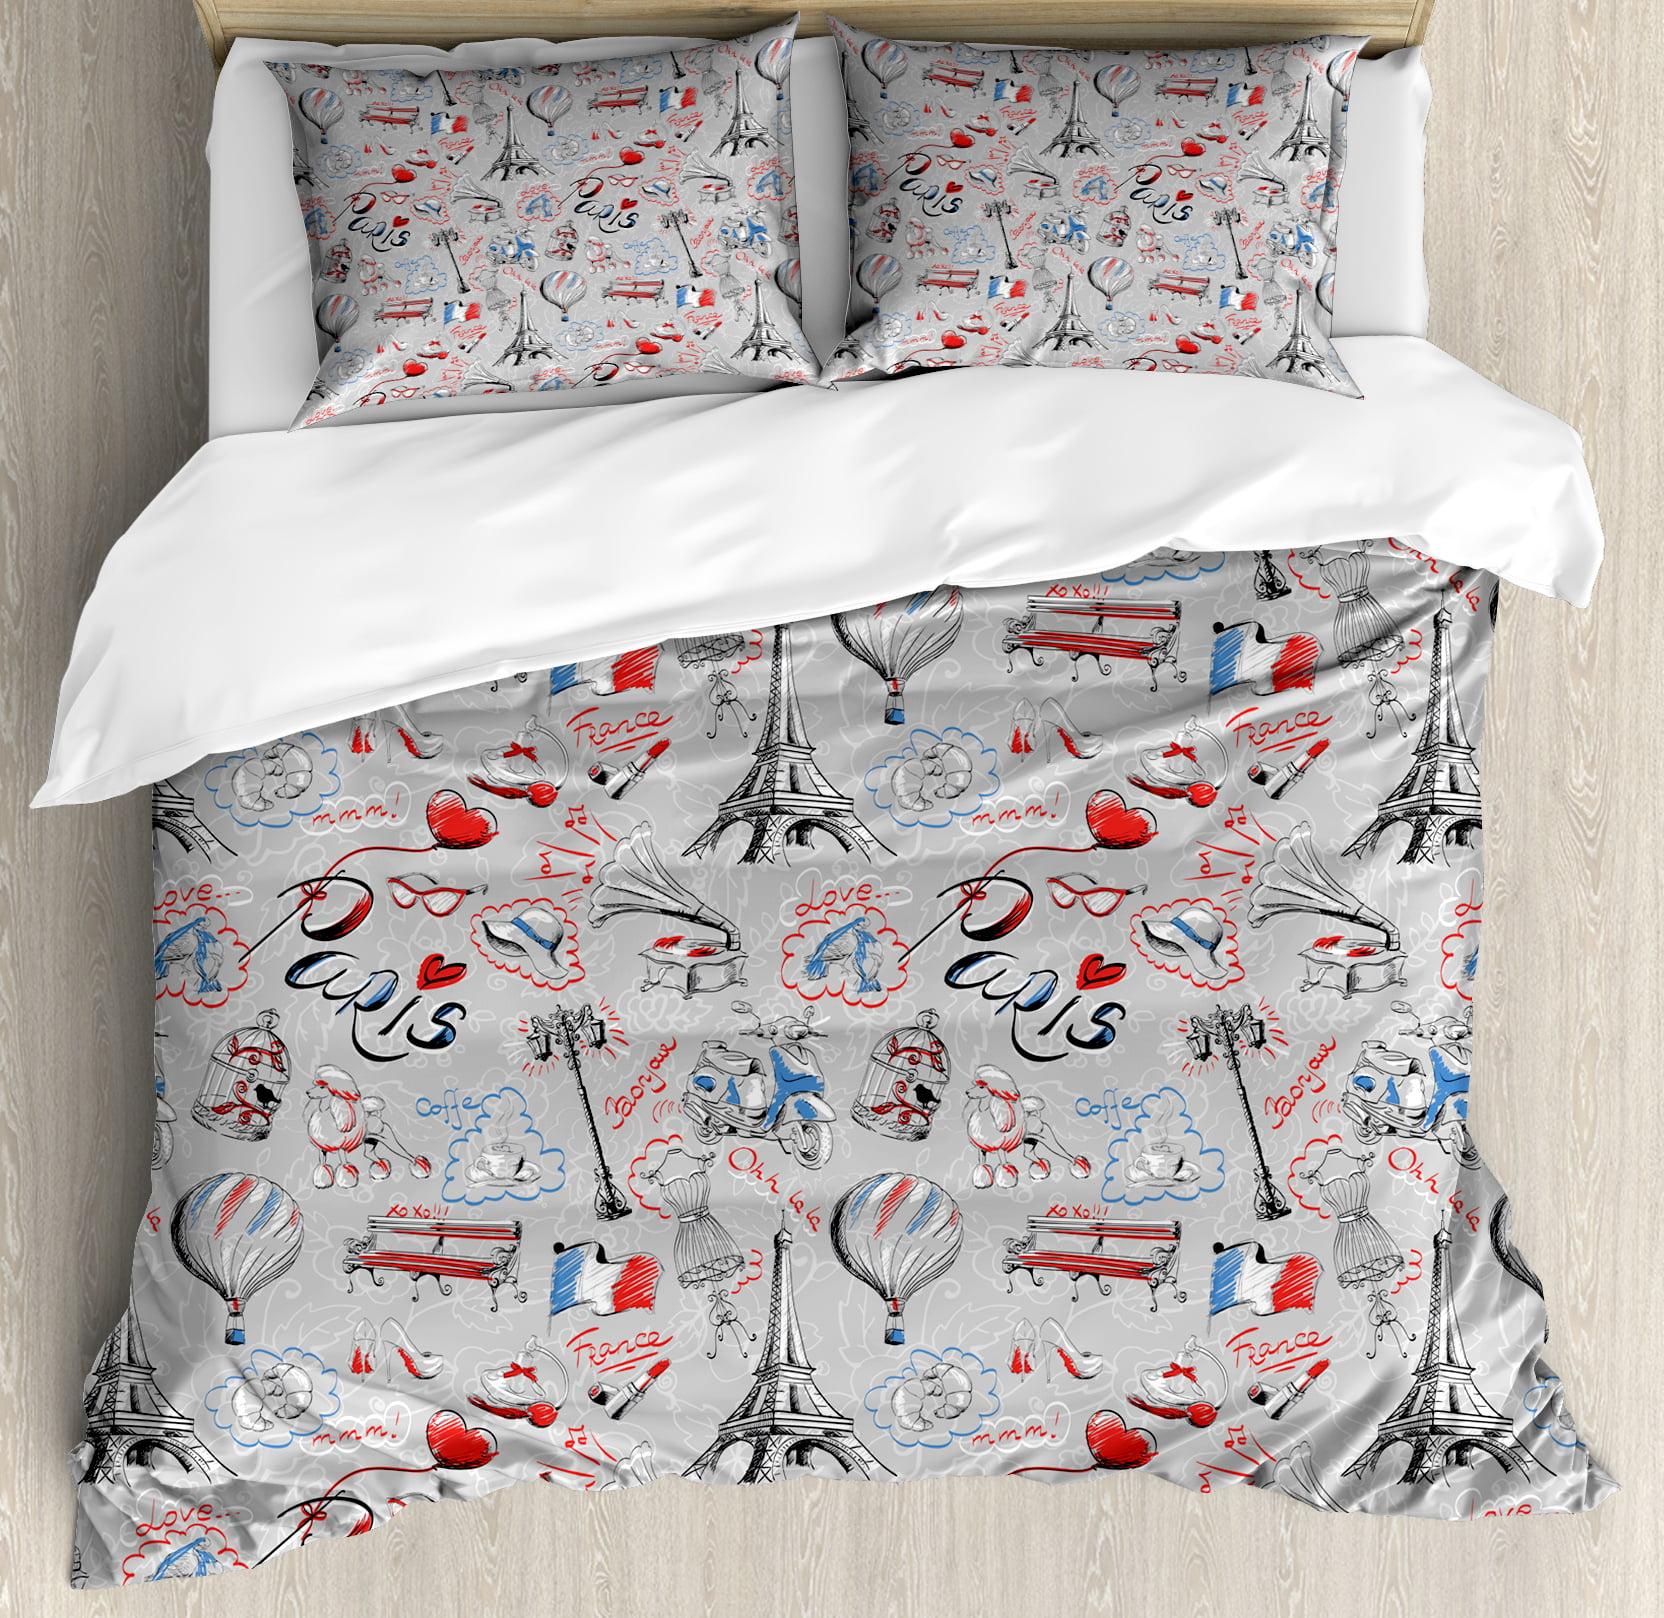 Paris Themed Bedding Walmart: Paris Queen Size Duvet Cover Set, France Themed Image With